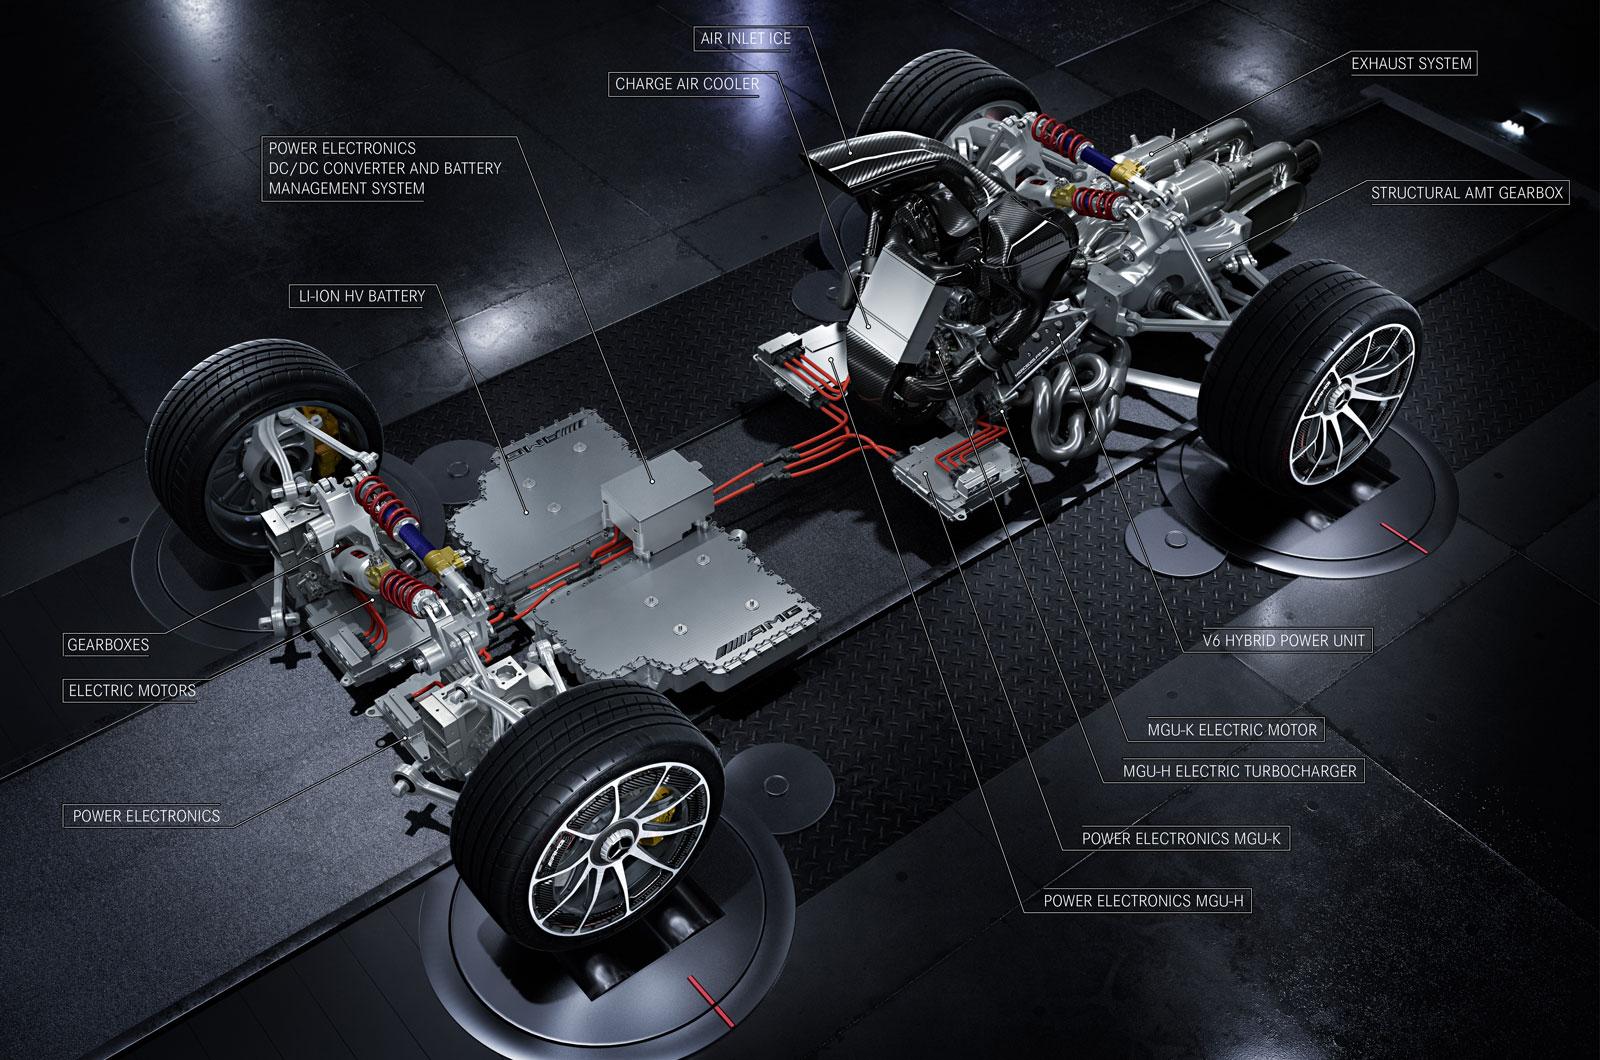 2018 Mercedes-AMG Project One powertrain specs revealed | Autocar